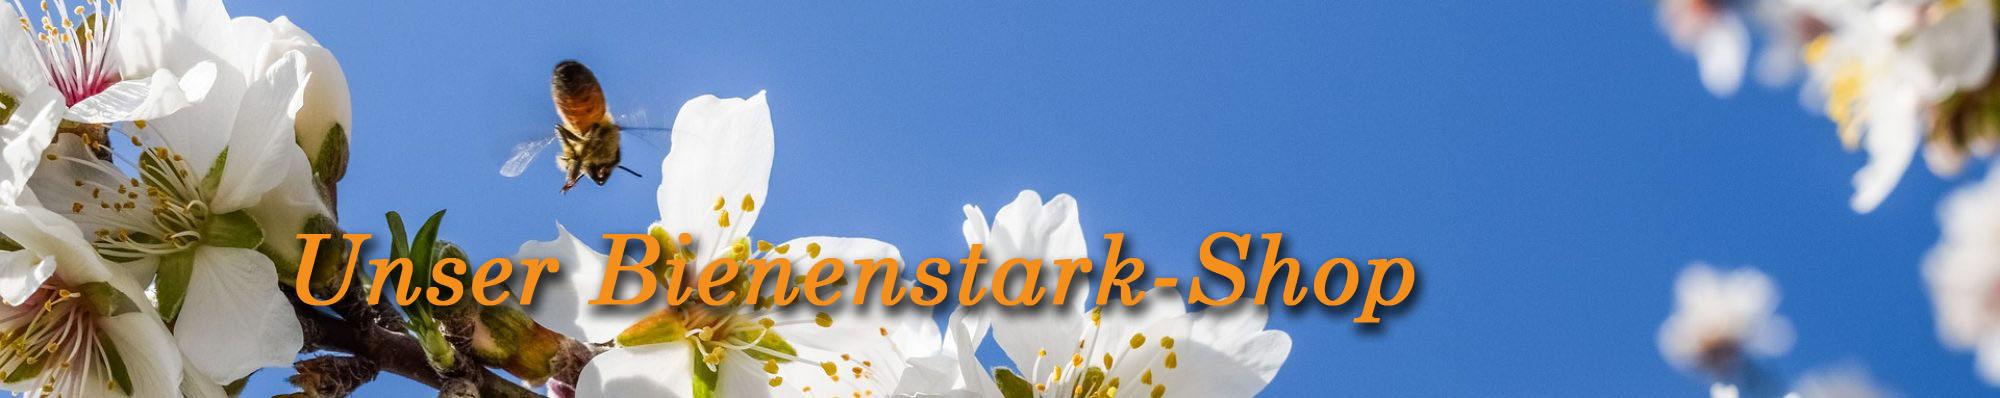 Bienenstark GmbH & Co KG